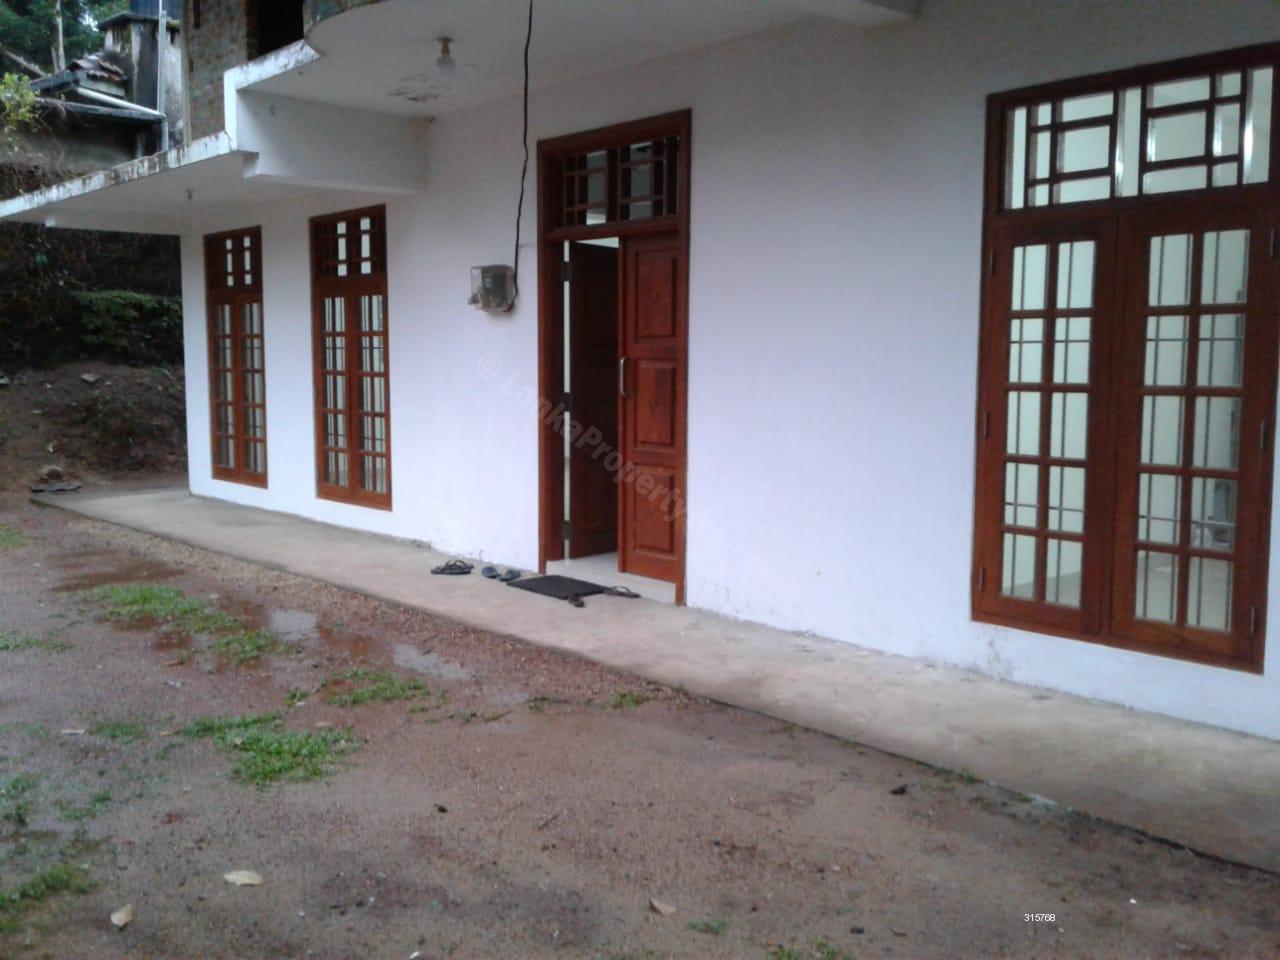 House for rent in Kadawatha - House for rent in Kadawatha